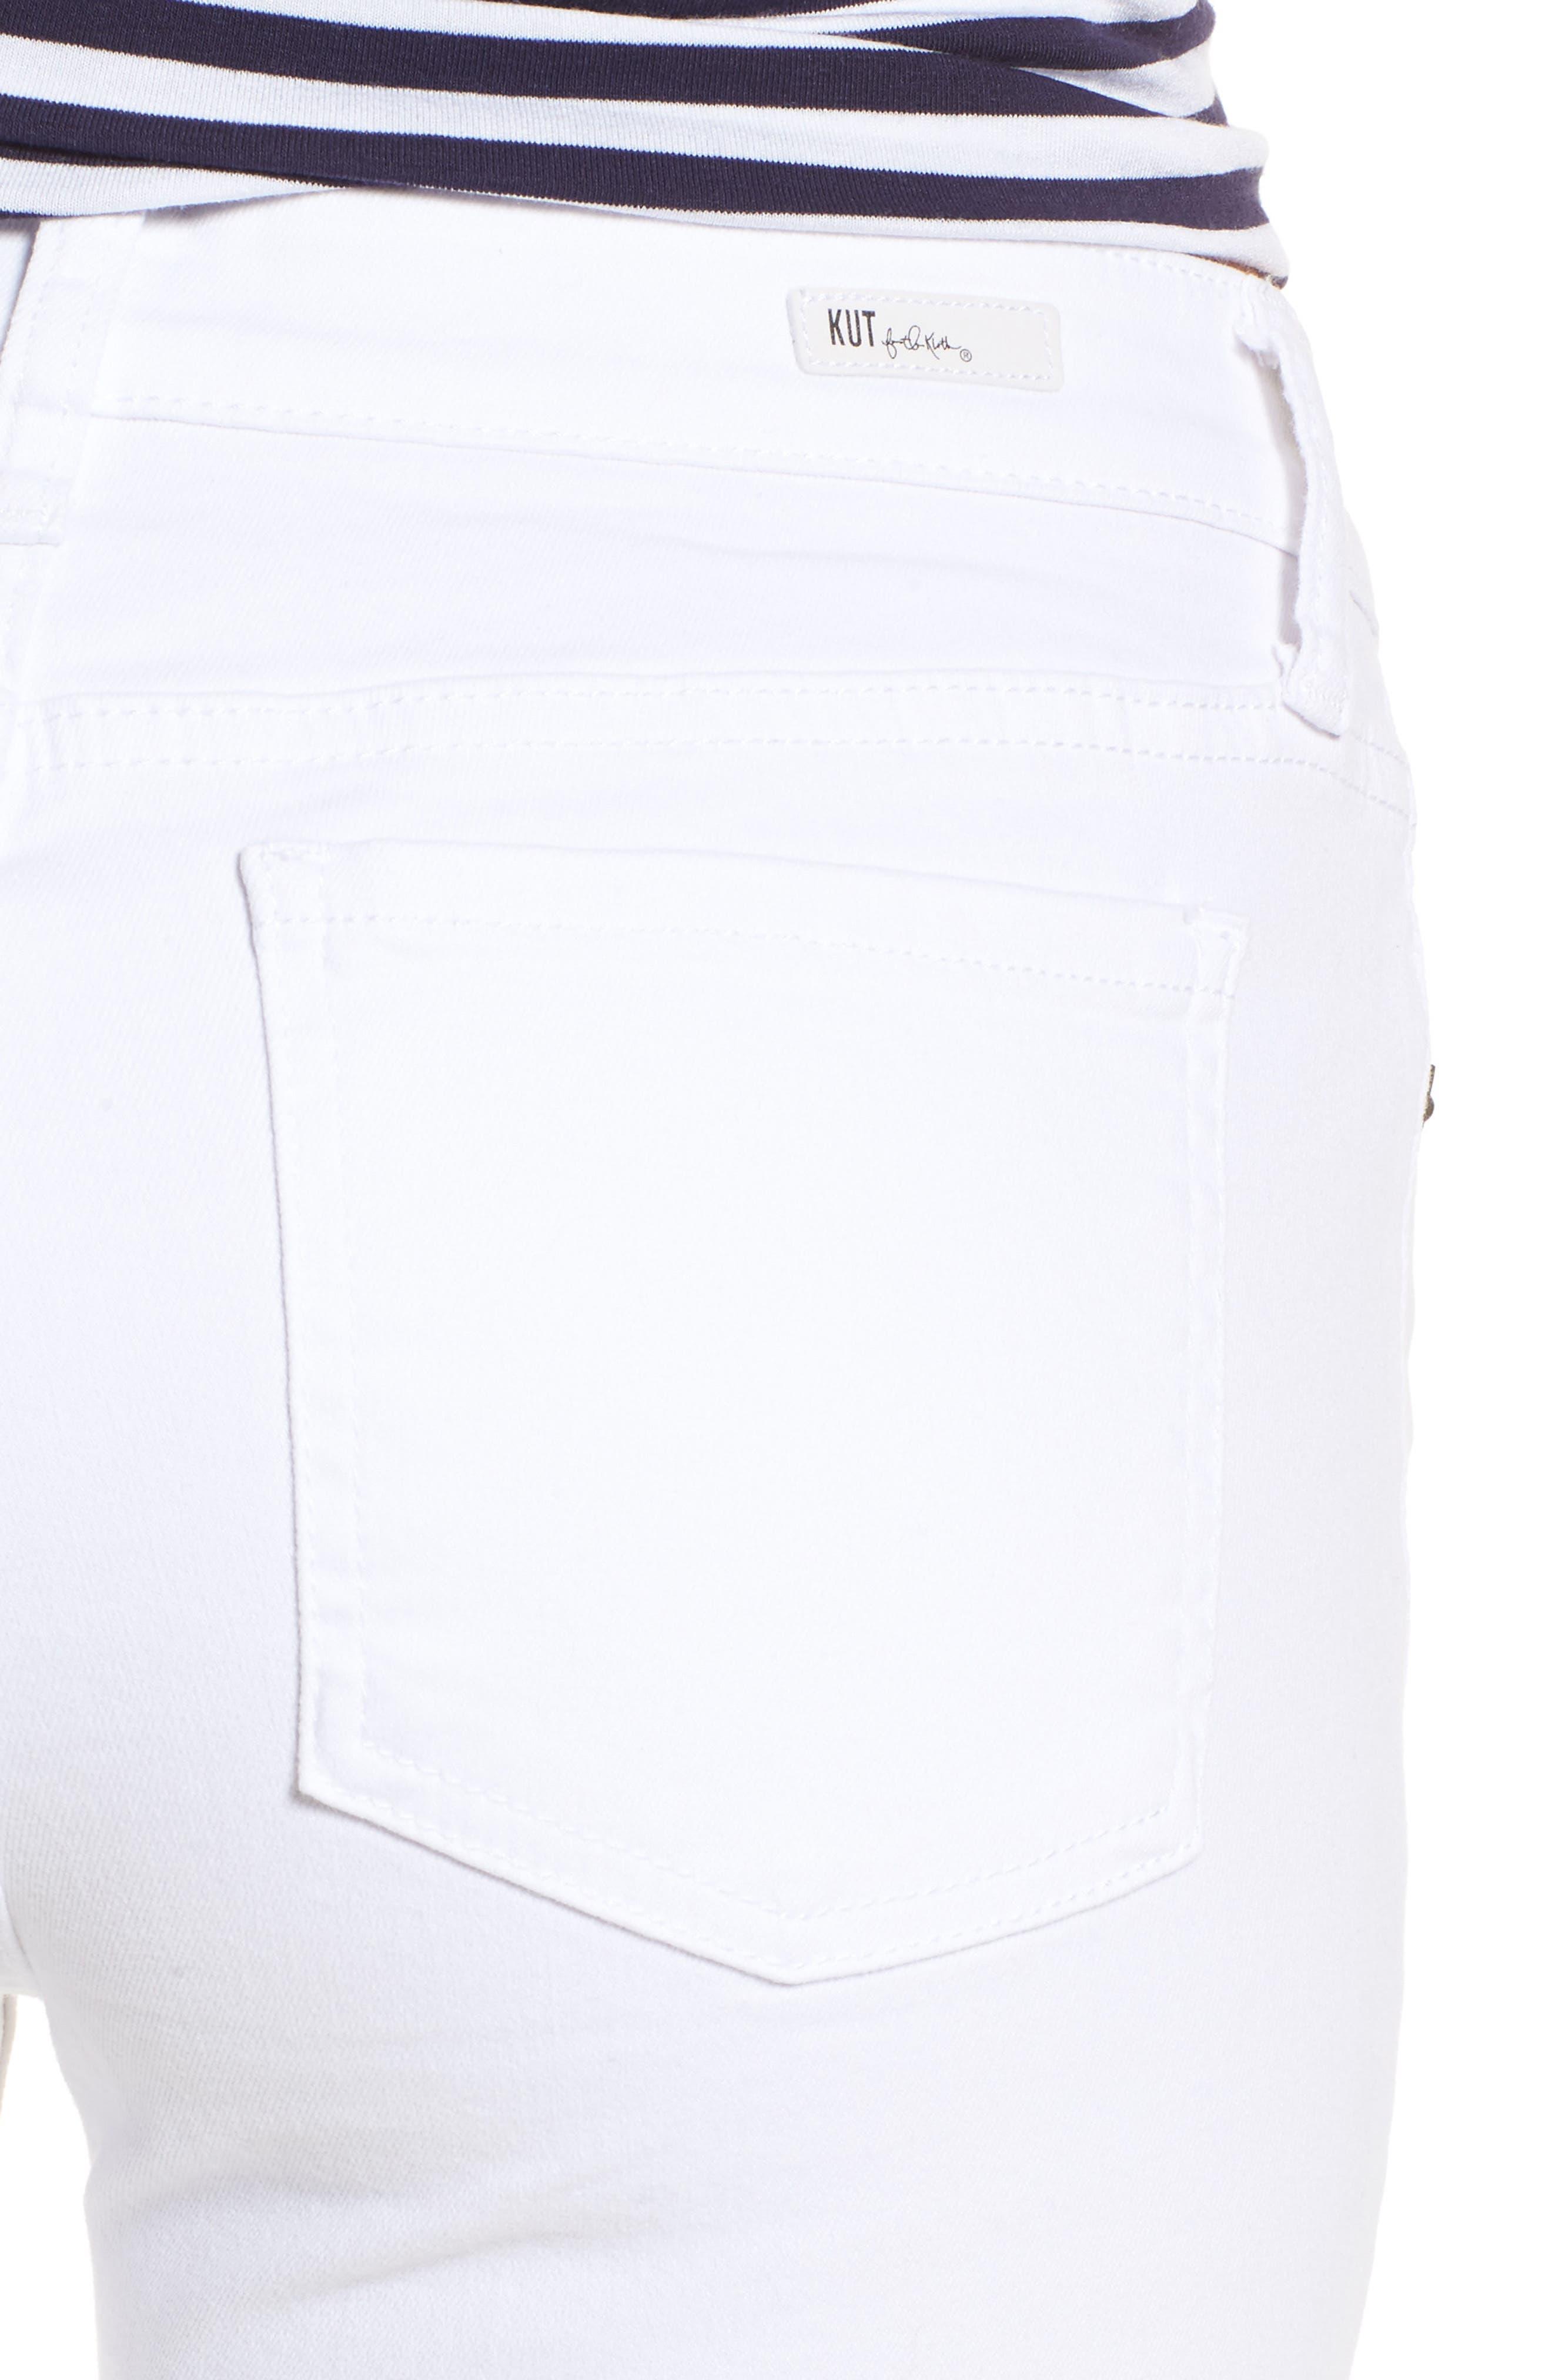 Mia Skinny Jeans,                             Alternate thumbnail 4, color,                             Optic White